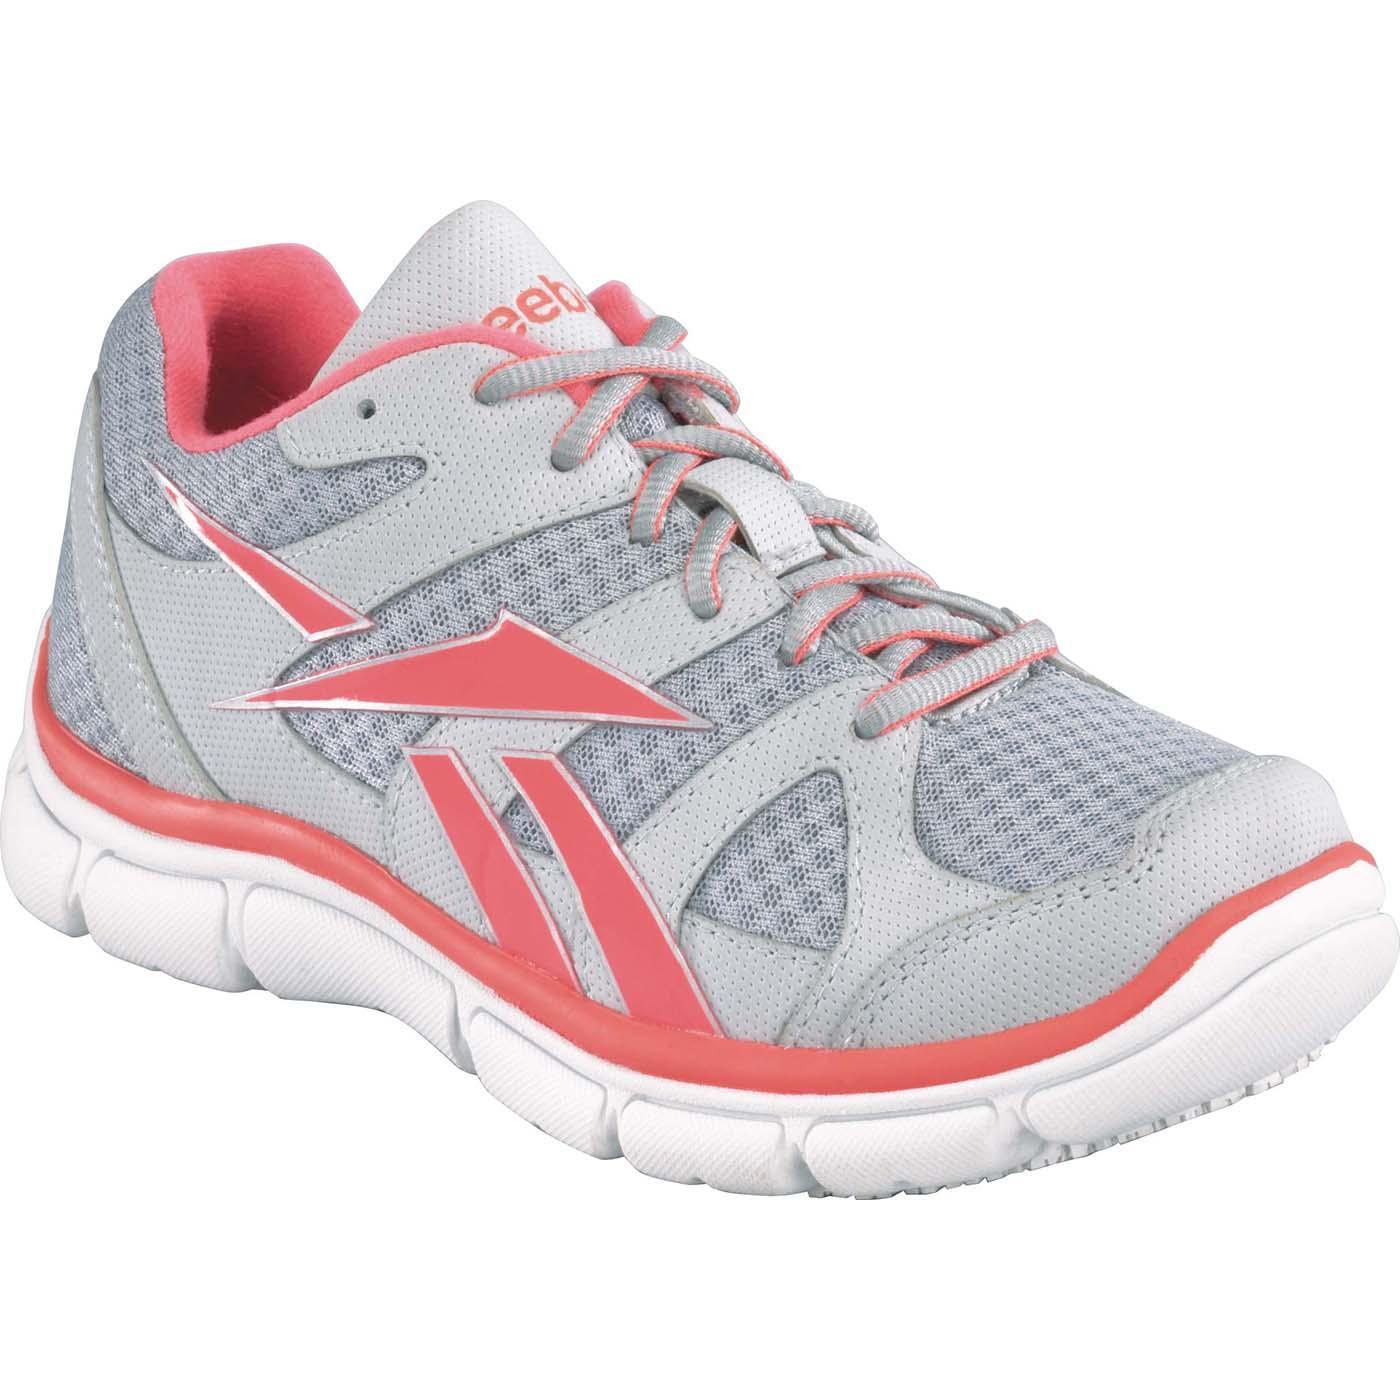 Reebok Women s Sport Grip Composite Toe Slip-Resistant Athletic Work Shoe 5b3db2622